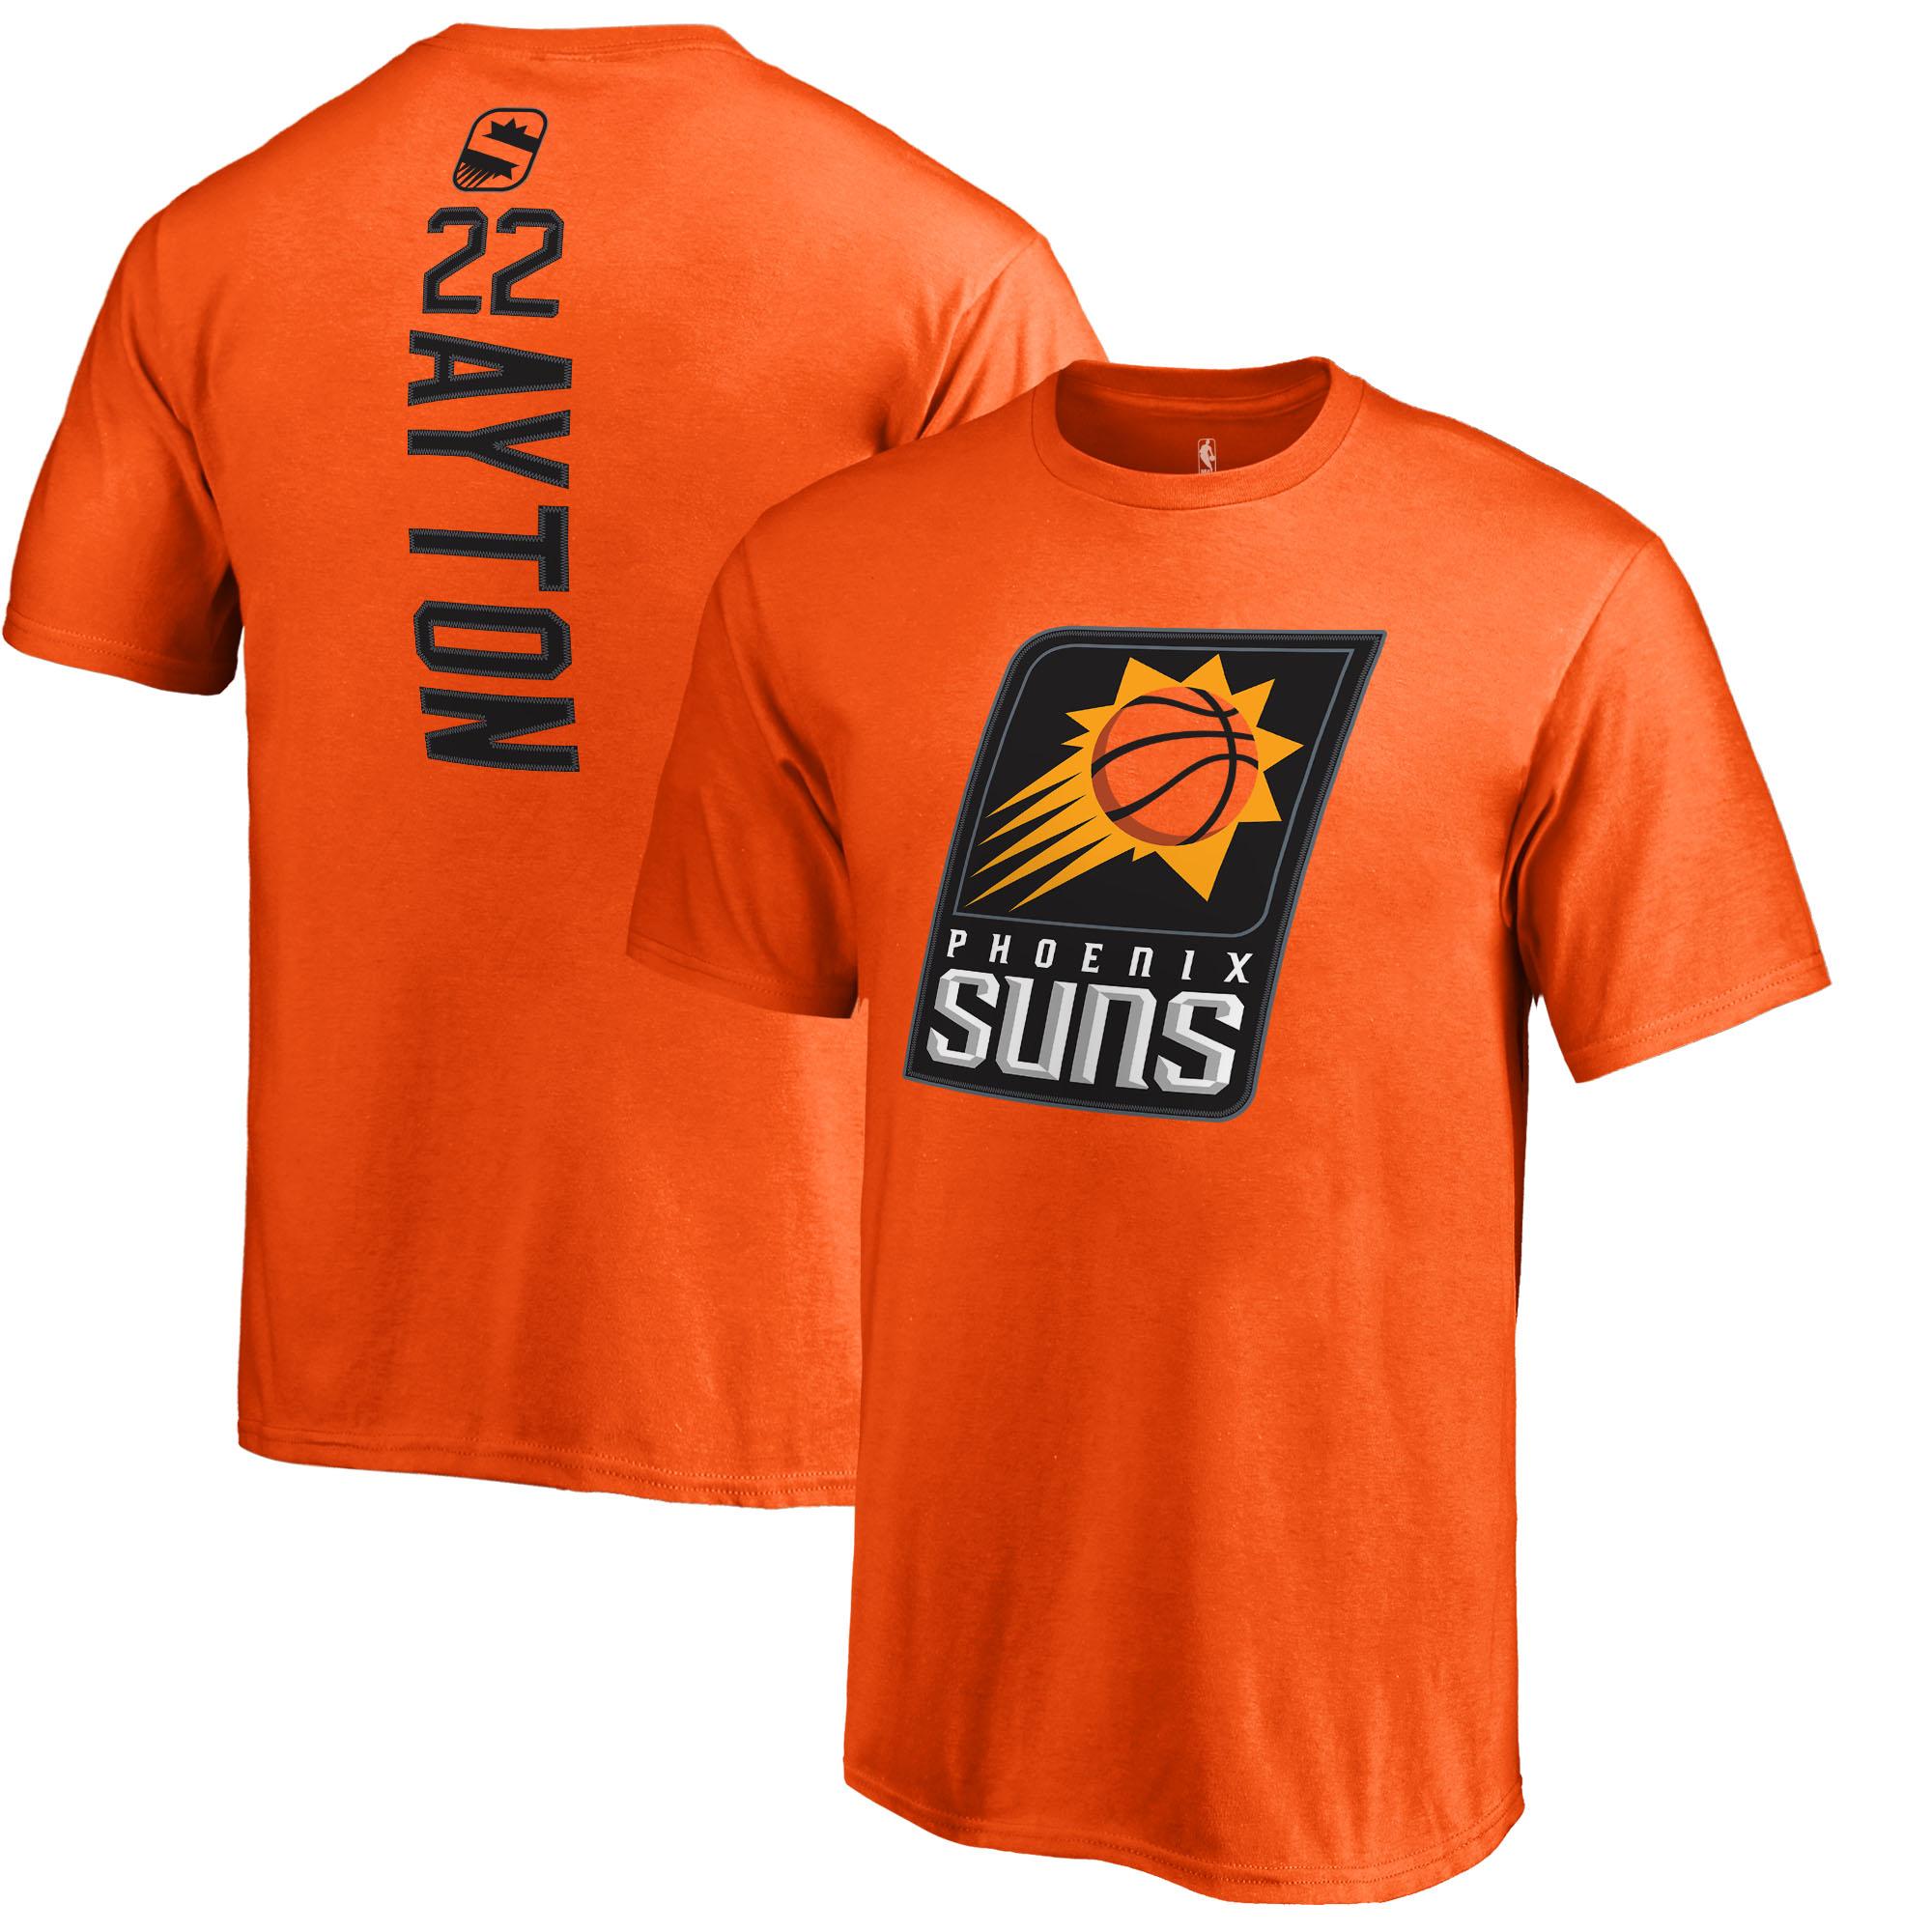 DeAndre Ayton Phoenix Suns Fanatics Branded Youth Team Backer Name & Number T-Shirt - Orange